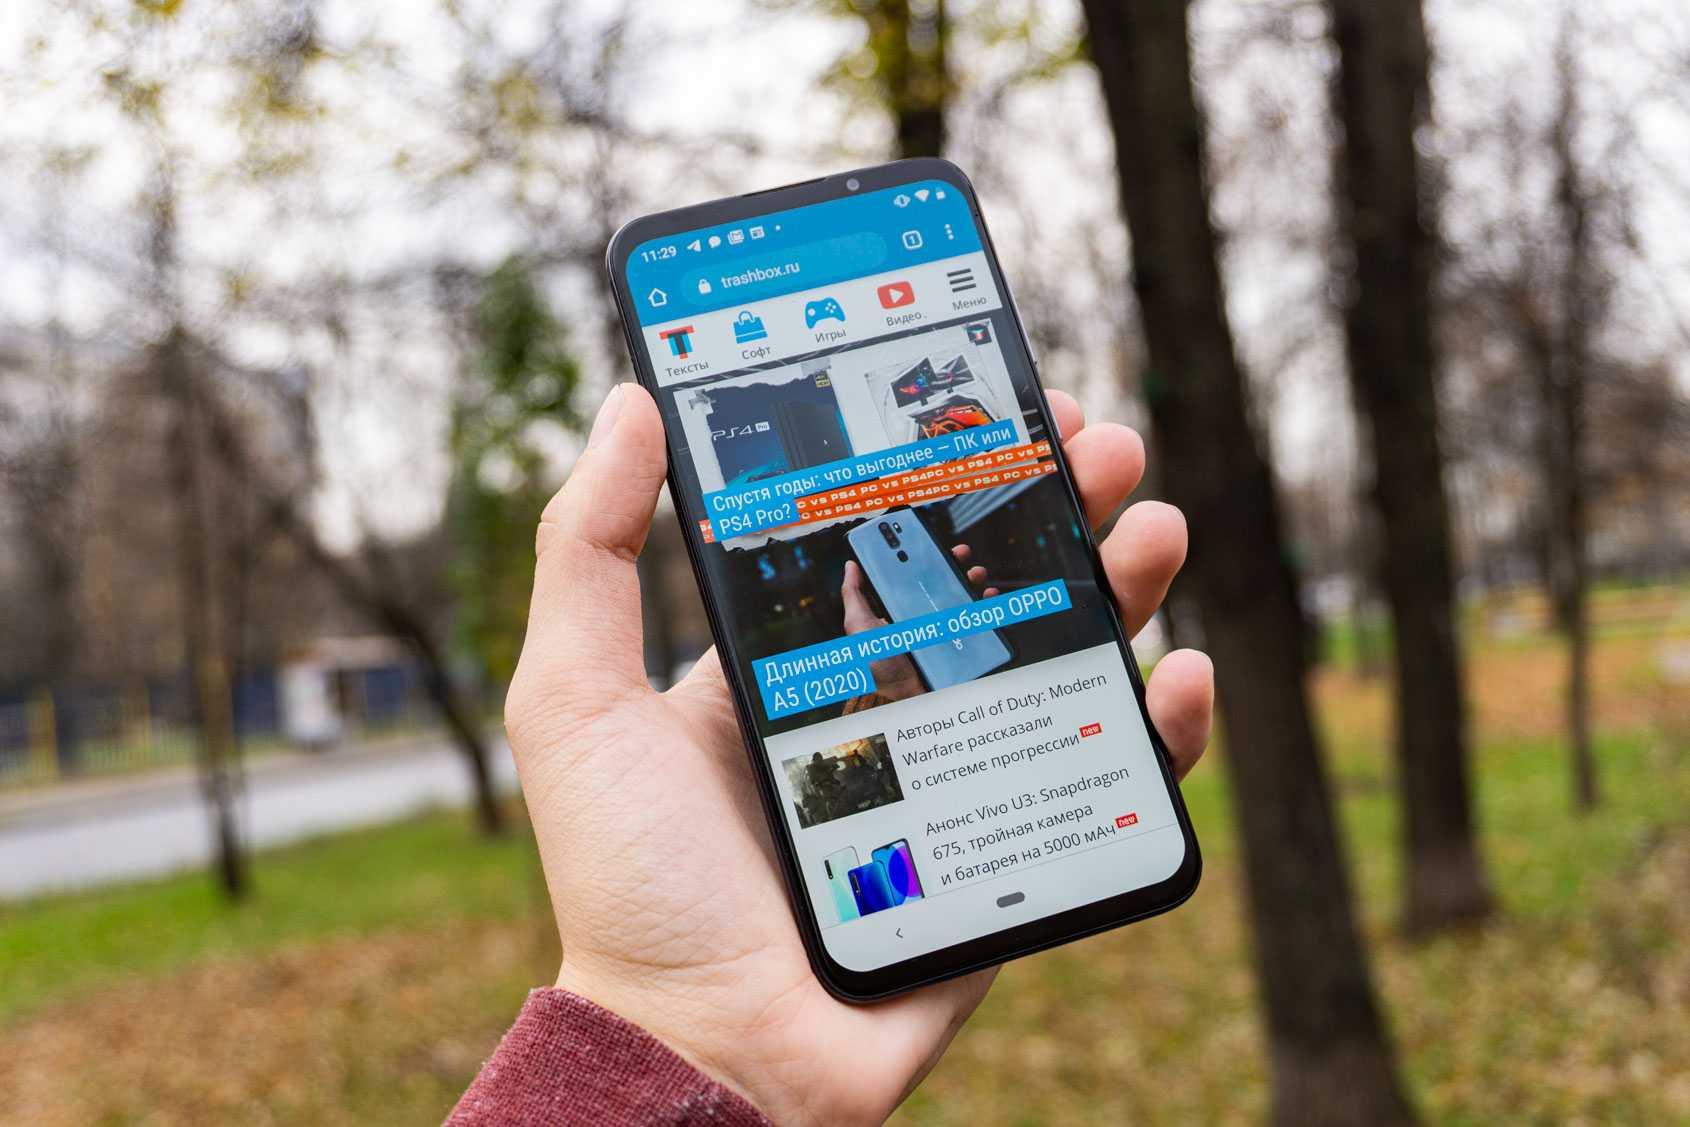 Смартфоны с oled-дисплеями скоро станут намного дешевле - androidinsider.ru